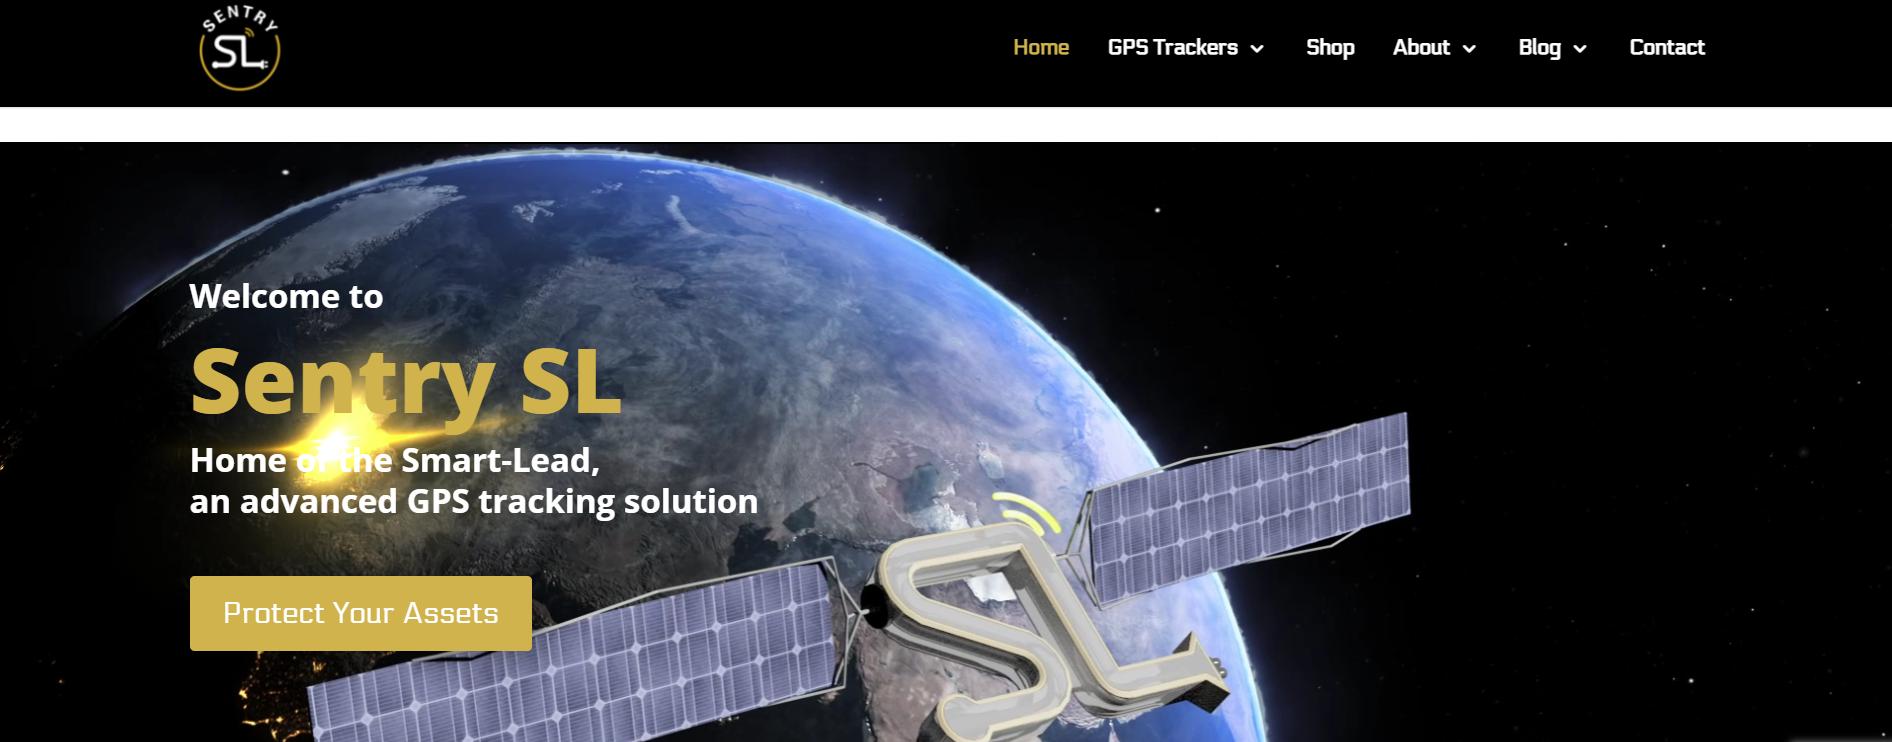 Sentry SL Homepage